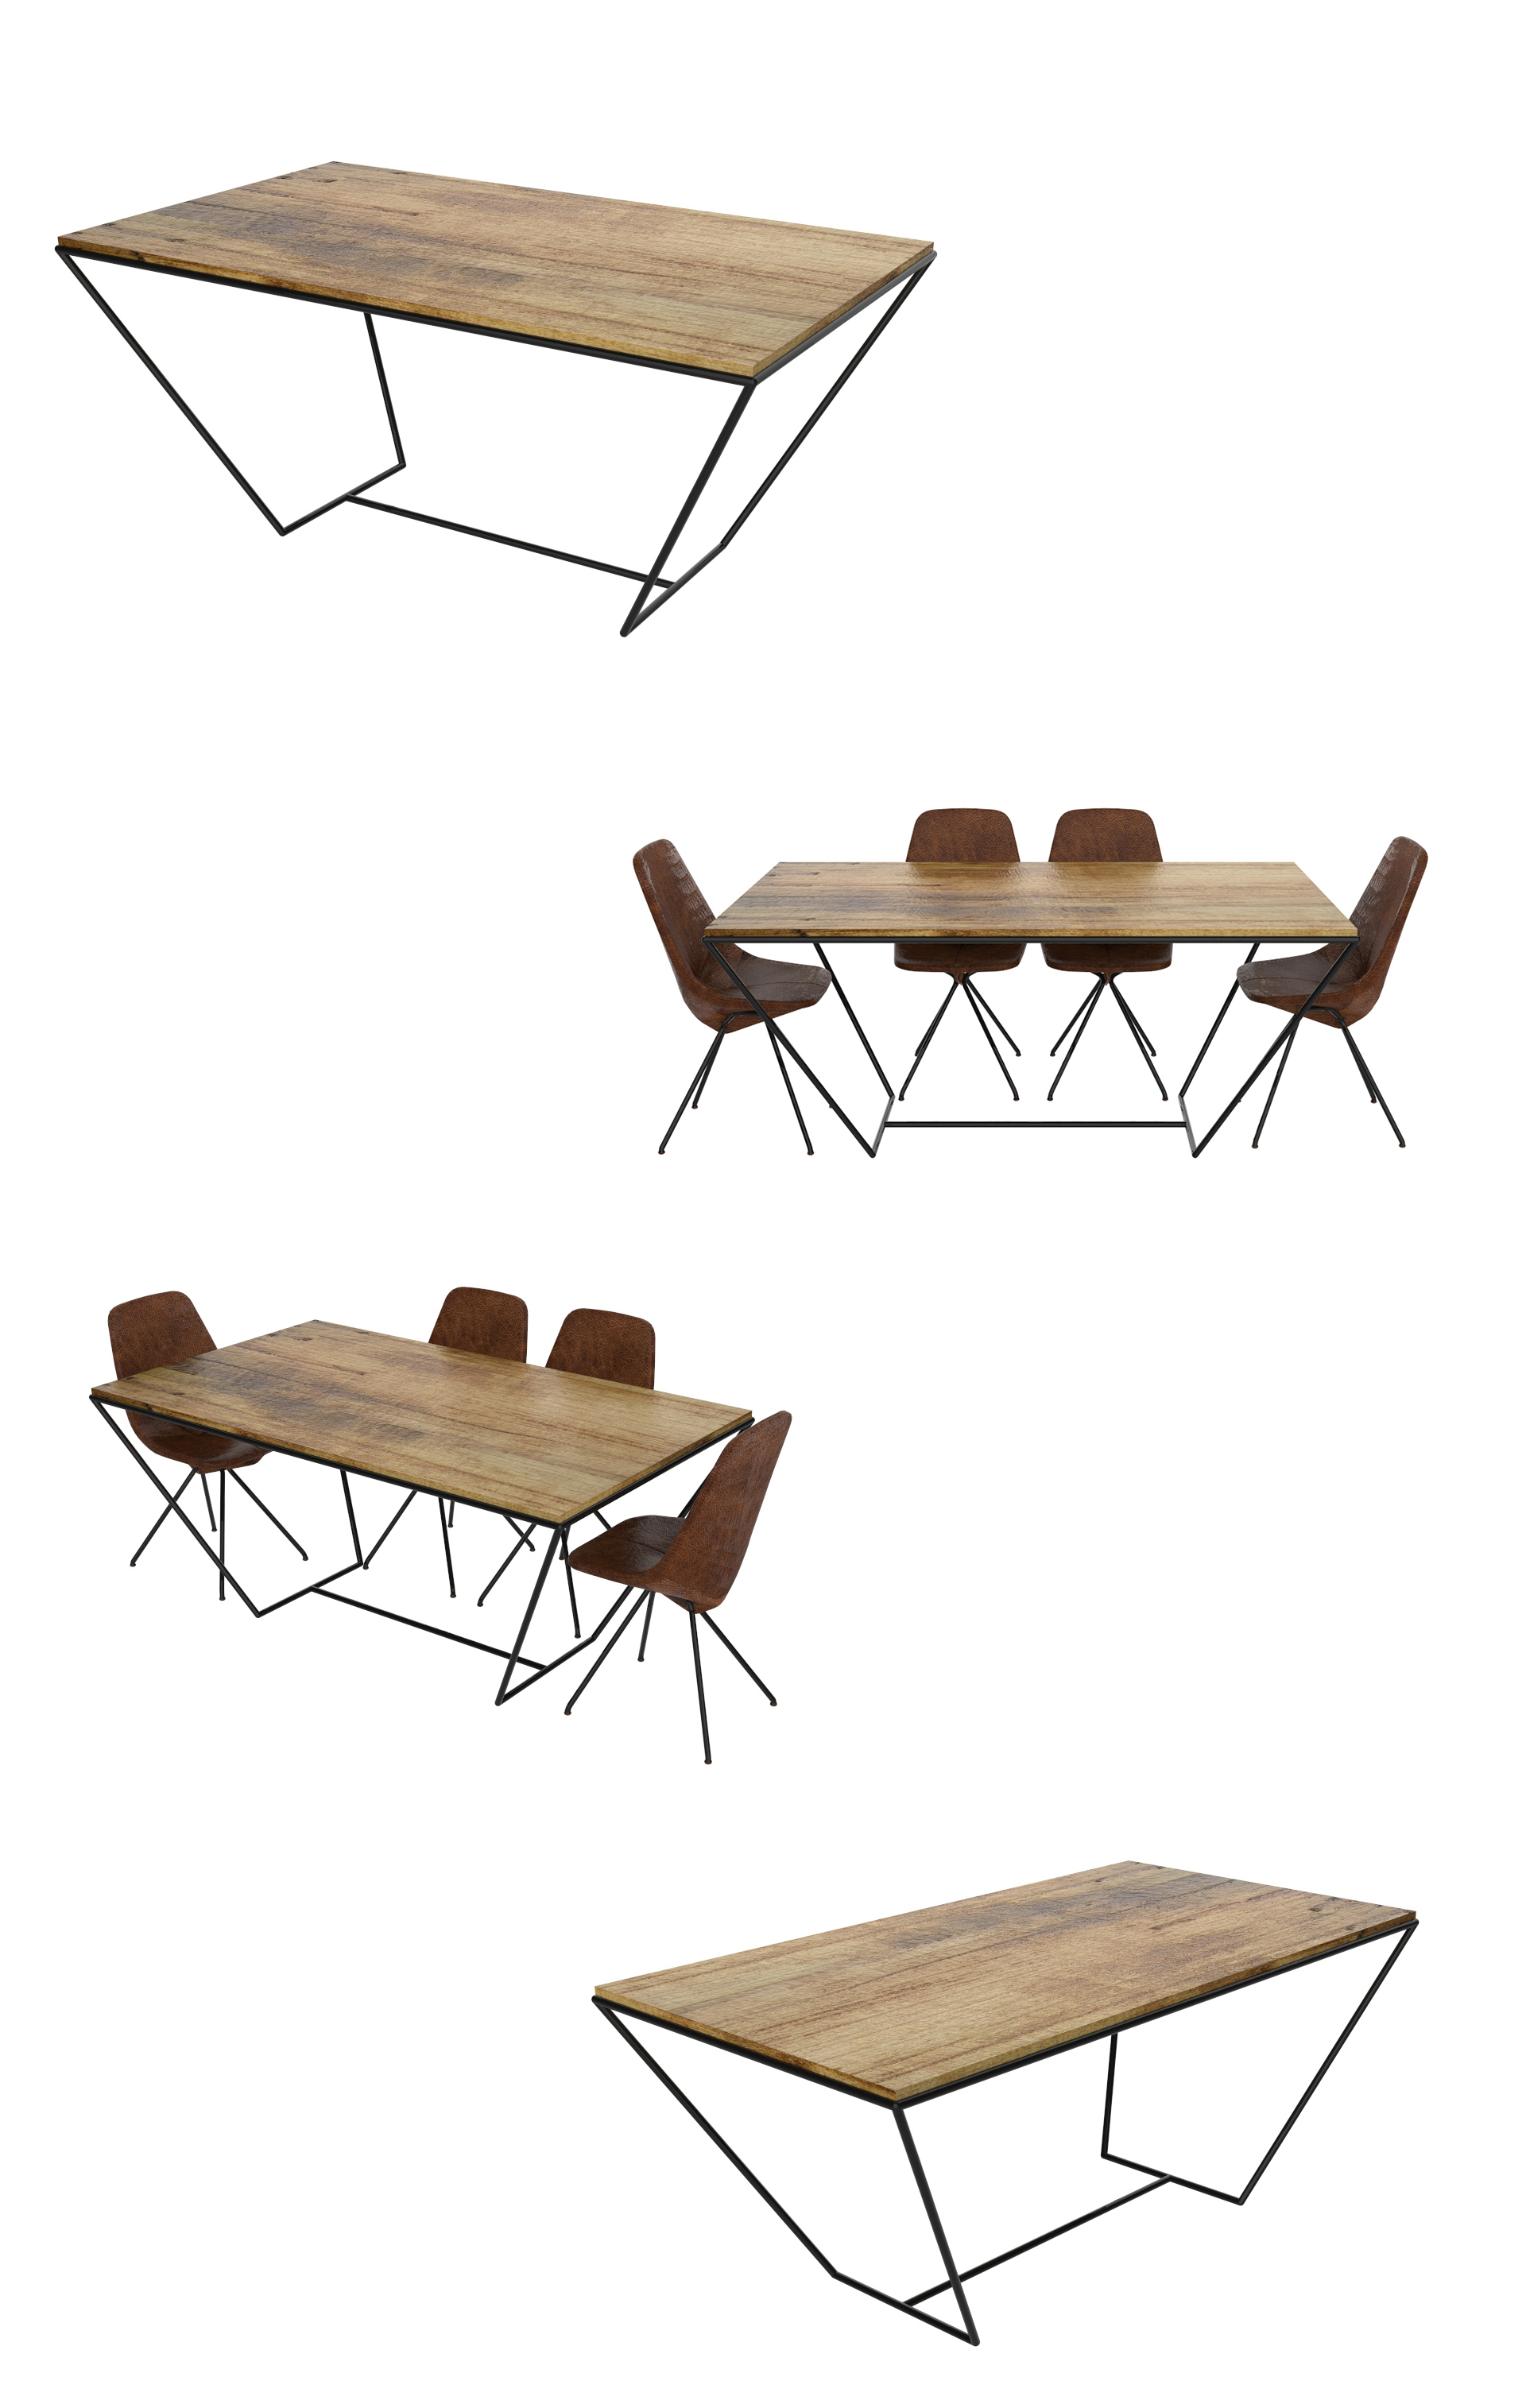 slant-table-pawlowska-design